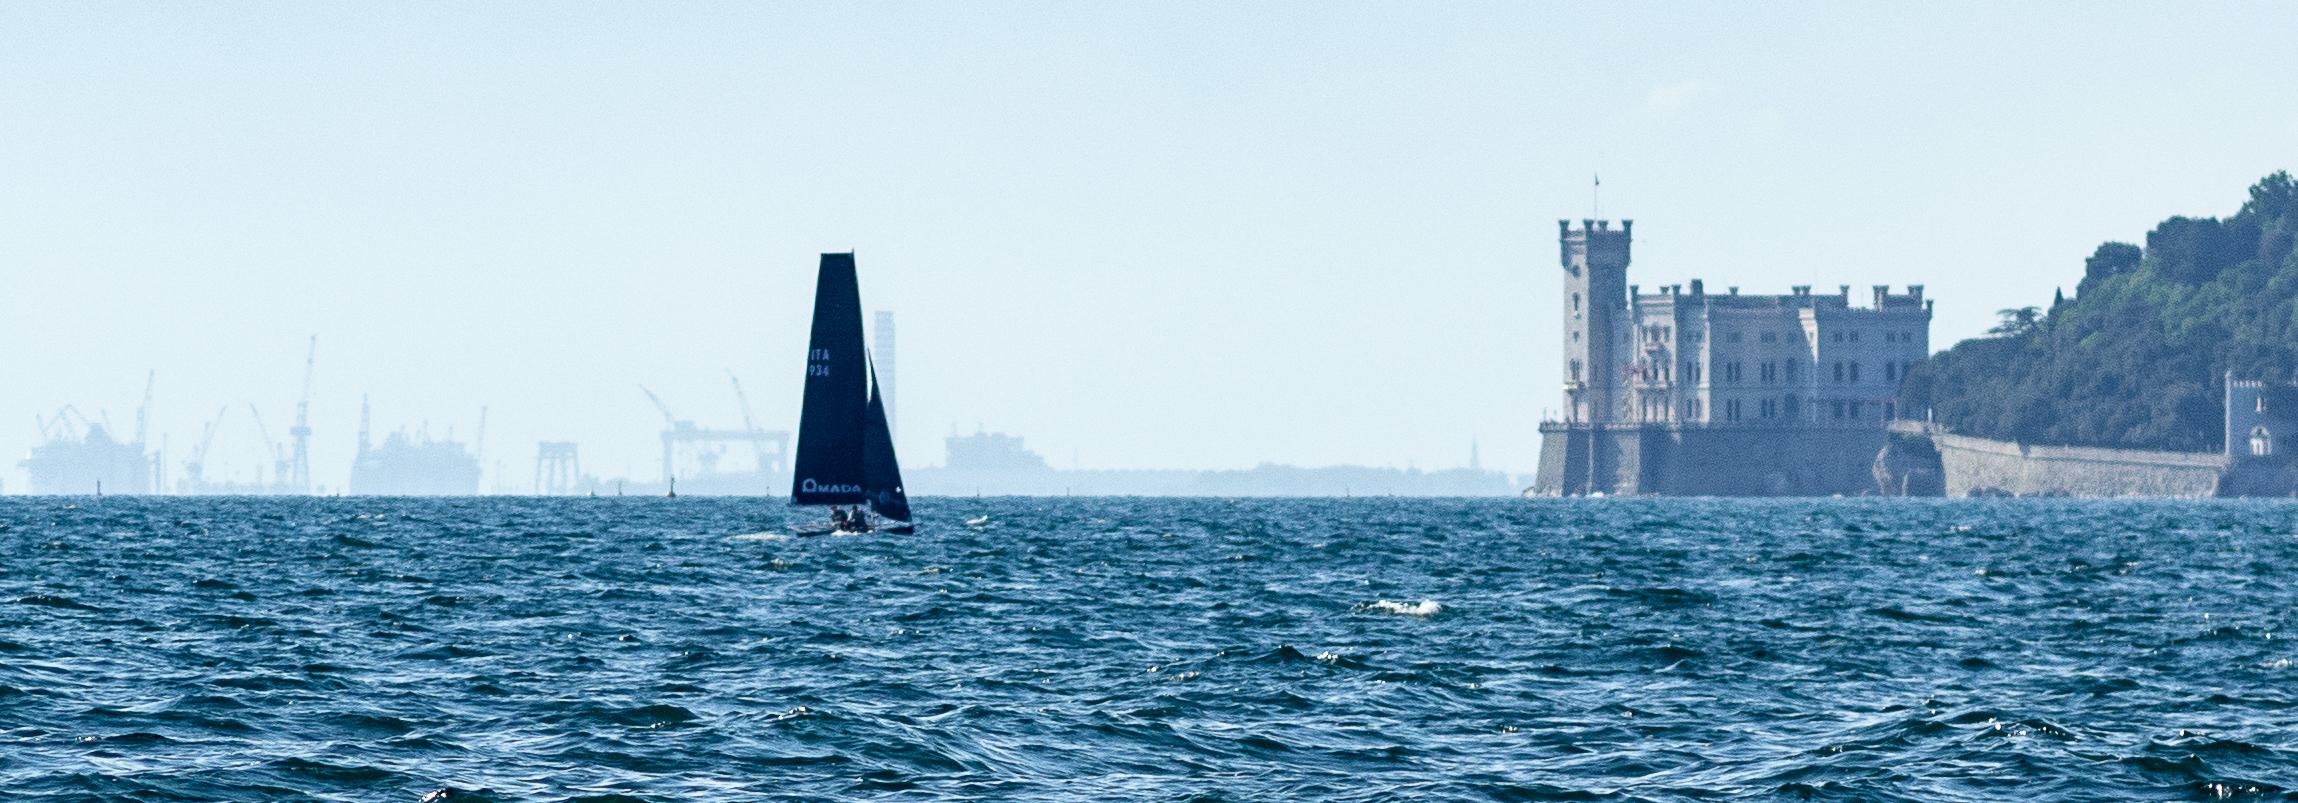 Audace Sailing Team